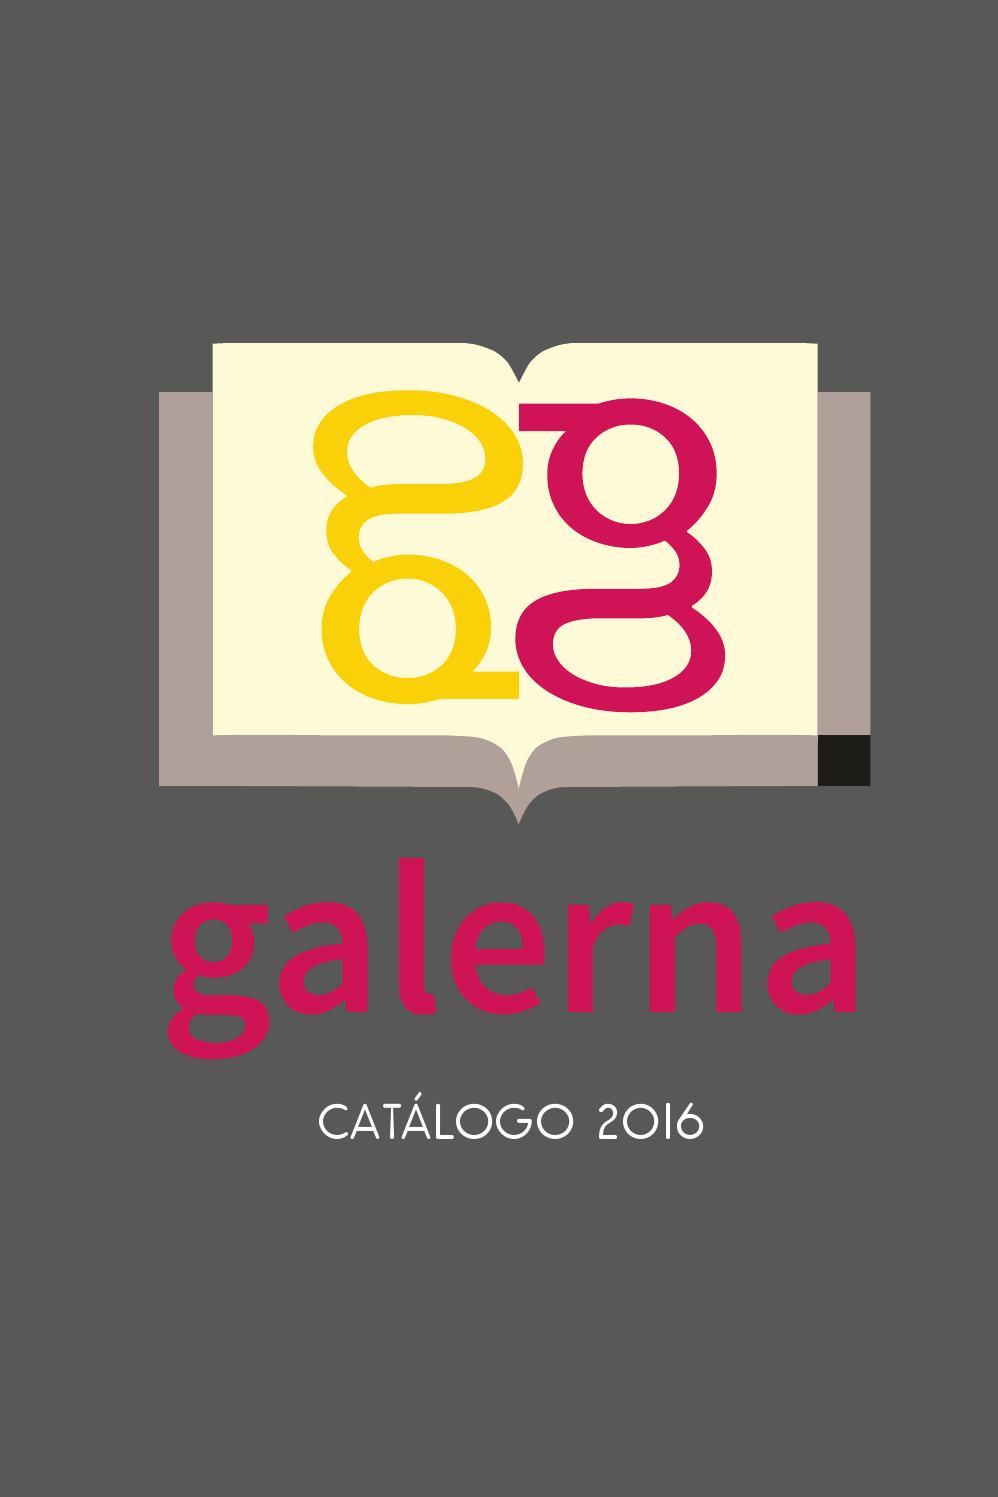 Catalogo Galerna 2016 by Galerna libros - issuu